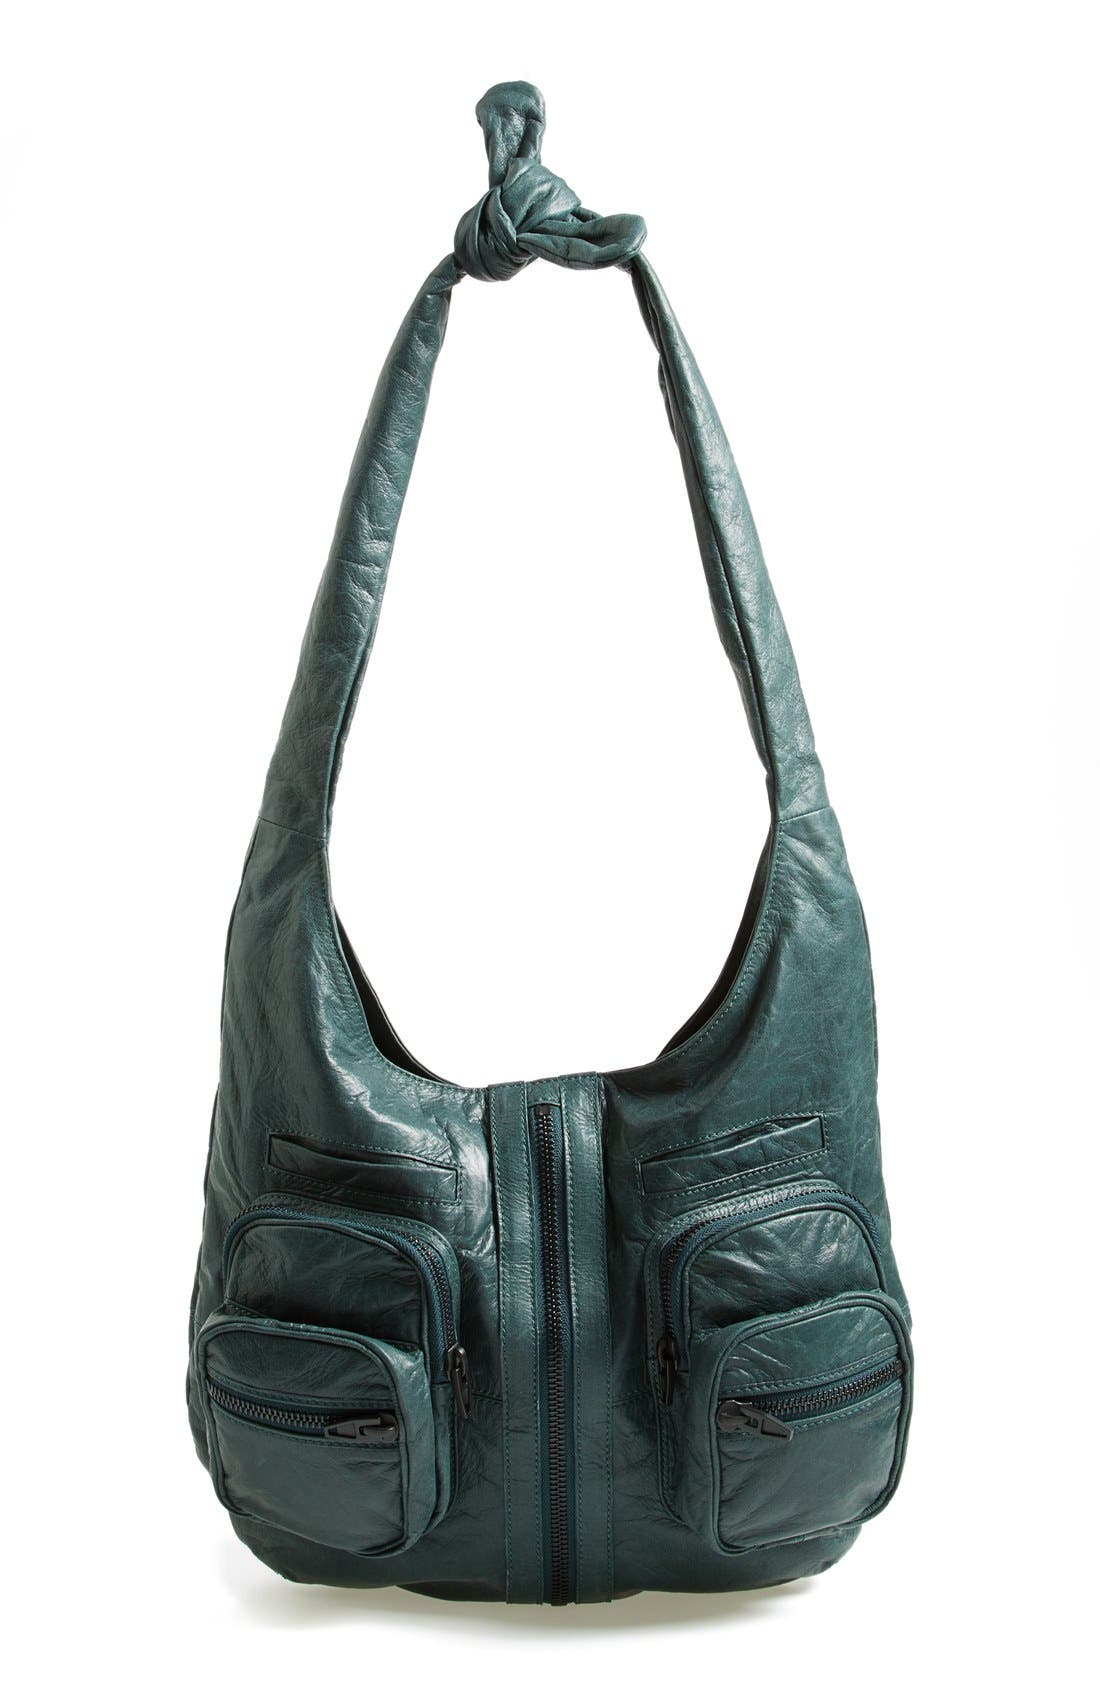 Main Image - Alexander Wang 'Donna' Leather Hobo